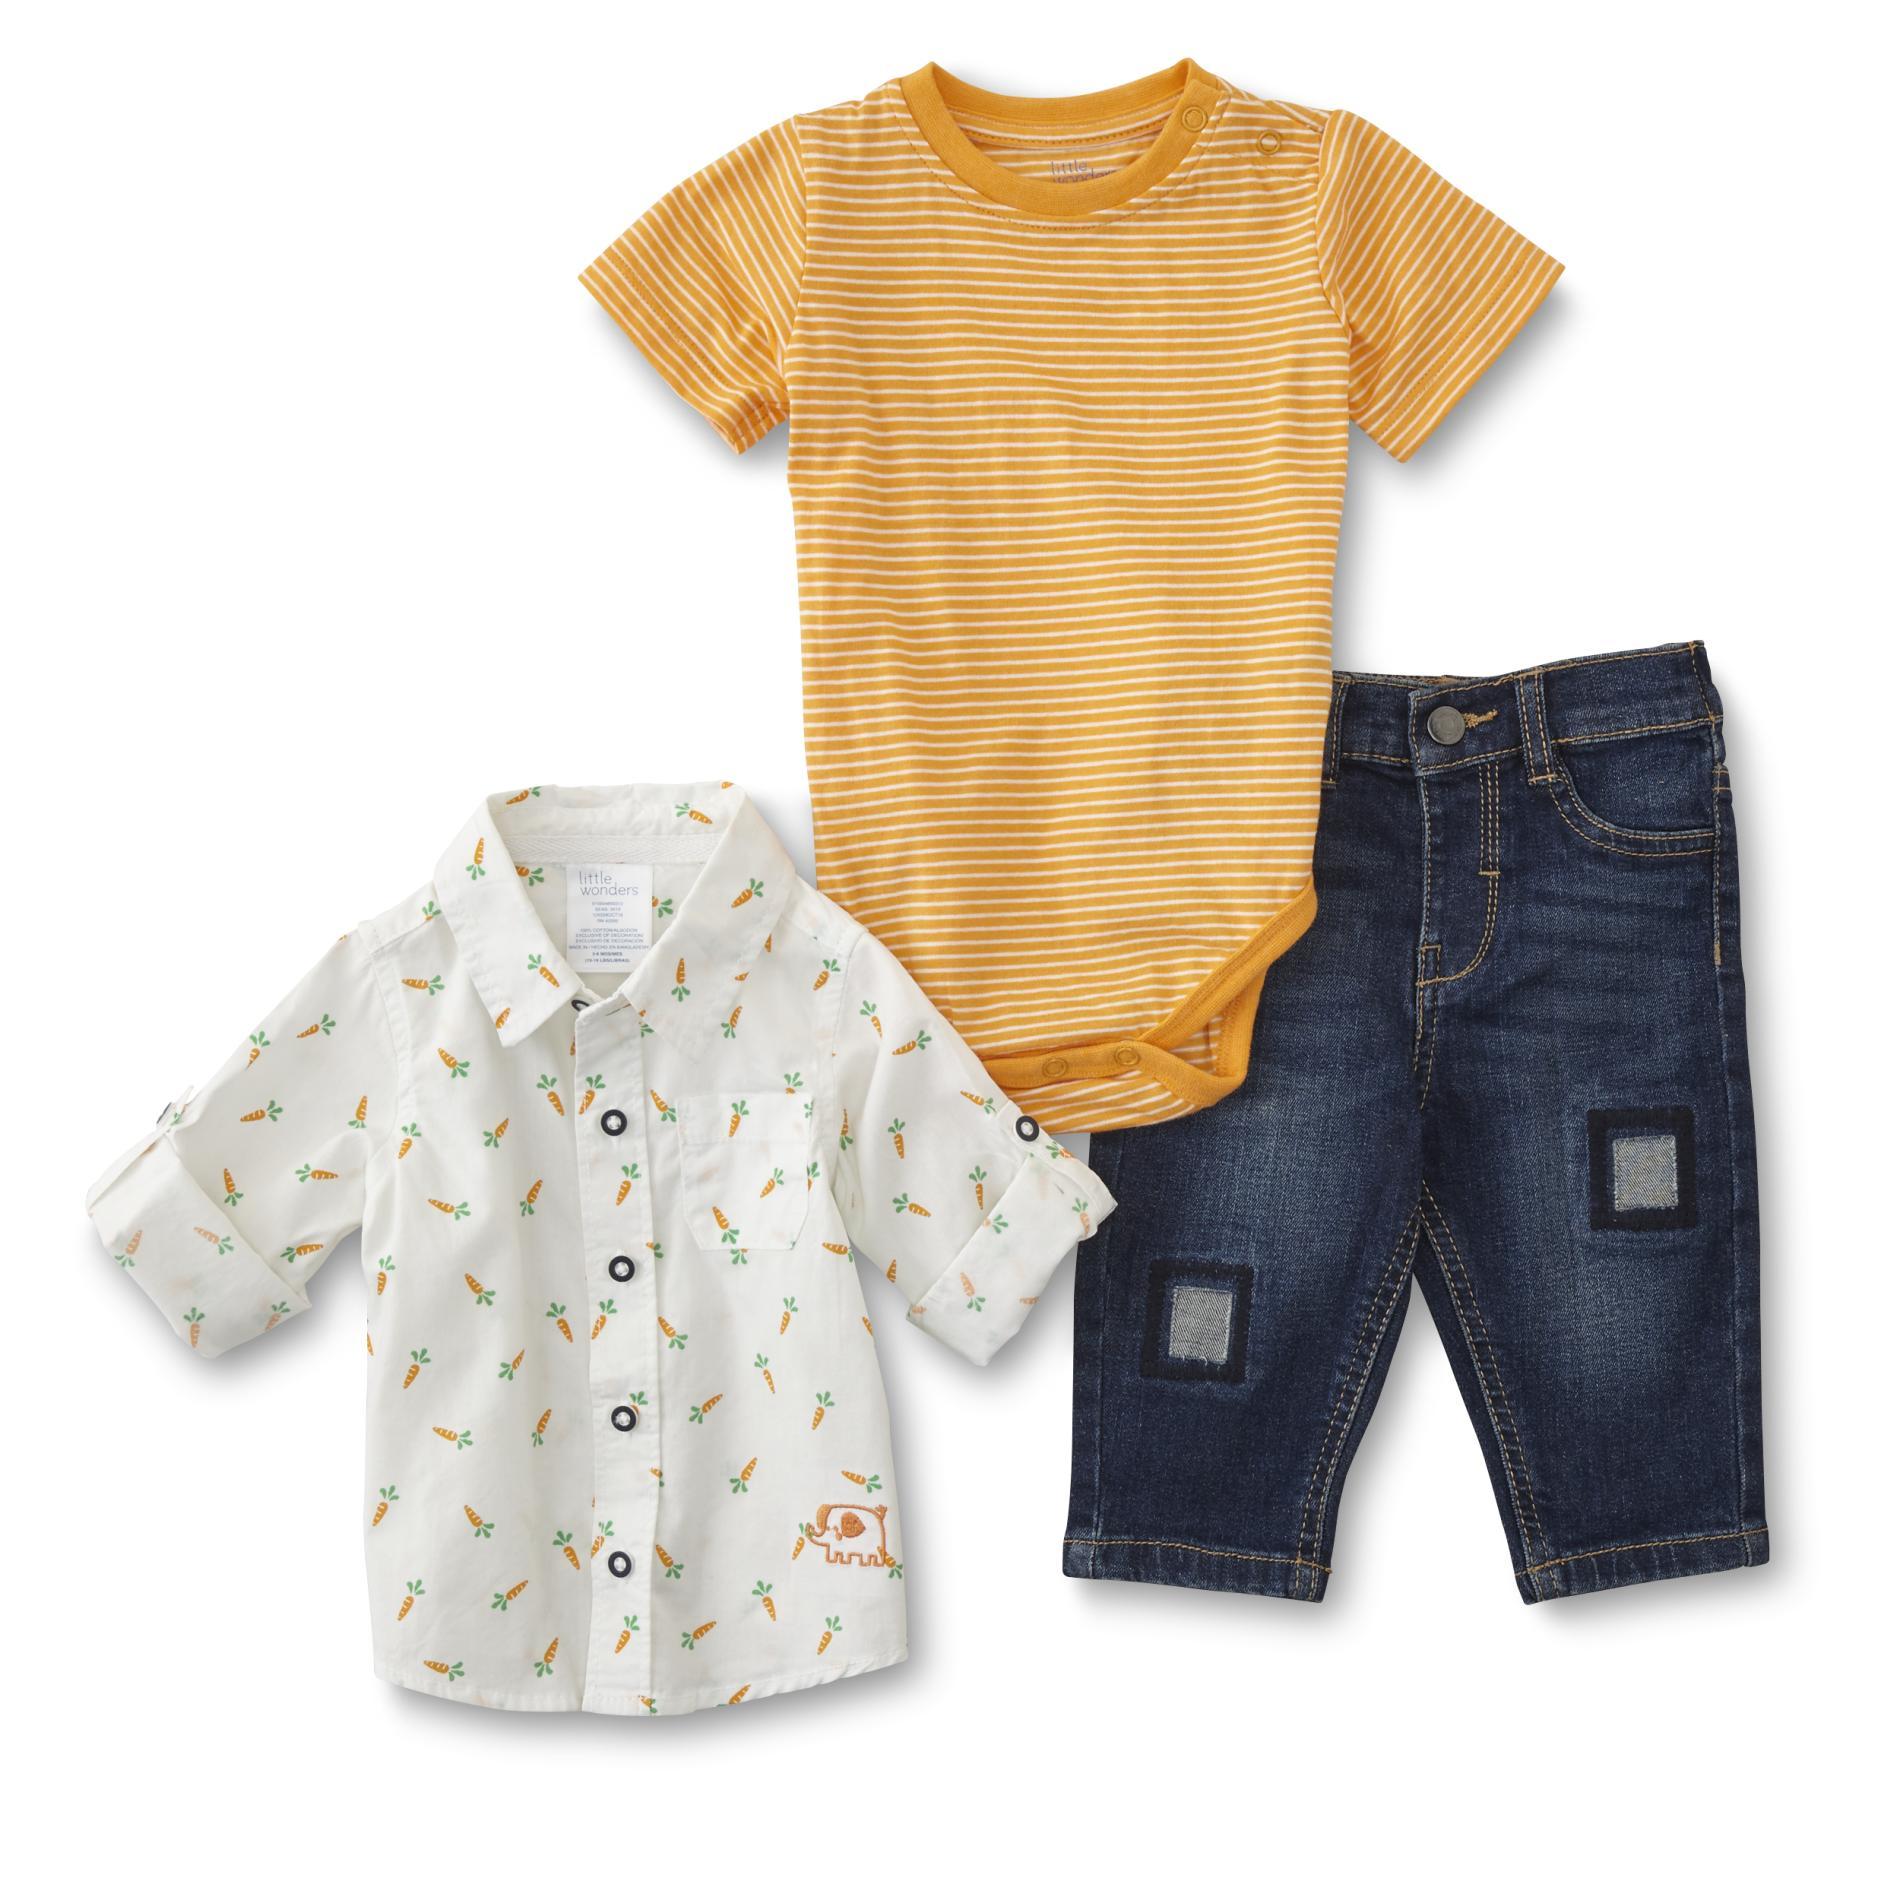 Little Wonders Infant Boys' Bodysuit, Shirt & Jeans - Striped & Elephant, Size: Newborn, Multi-color im test